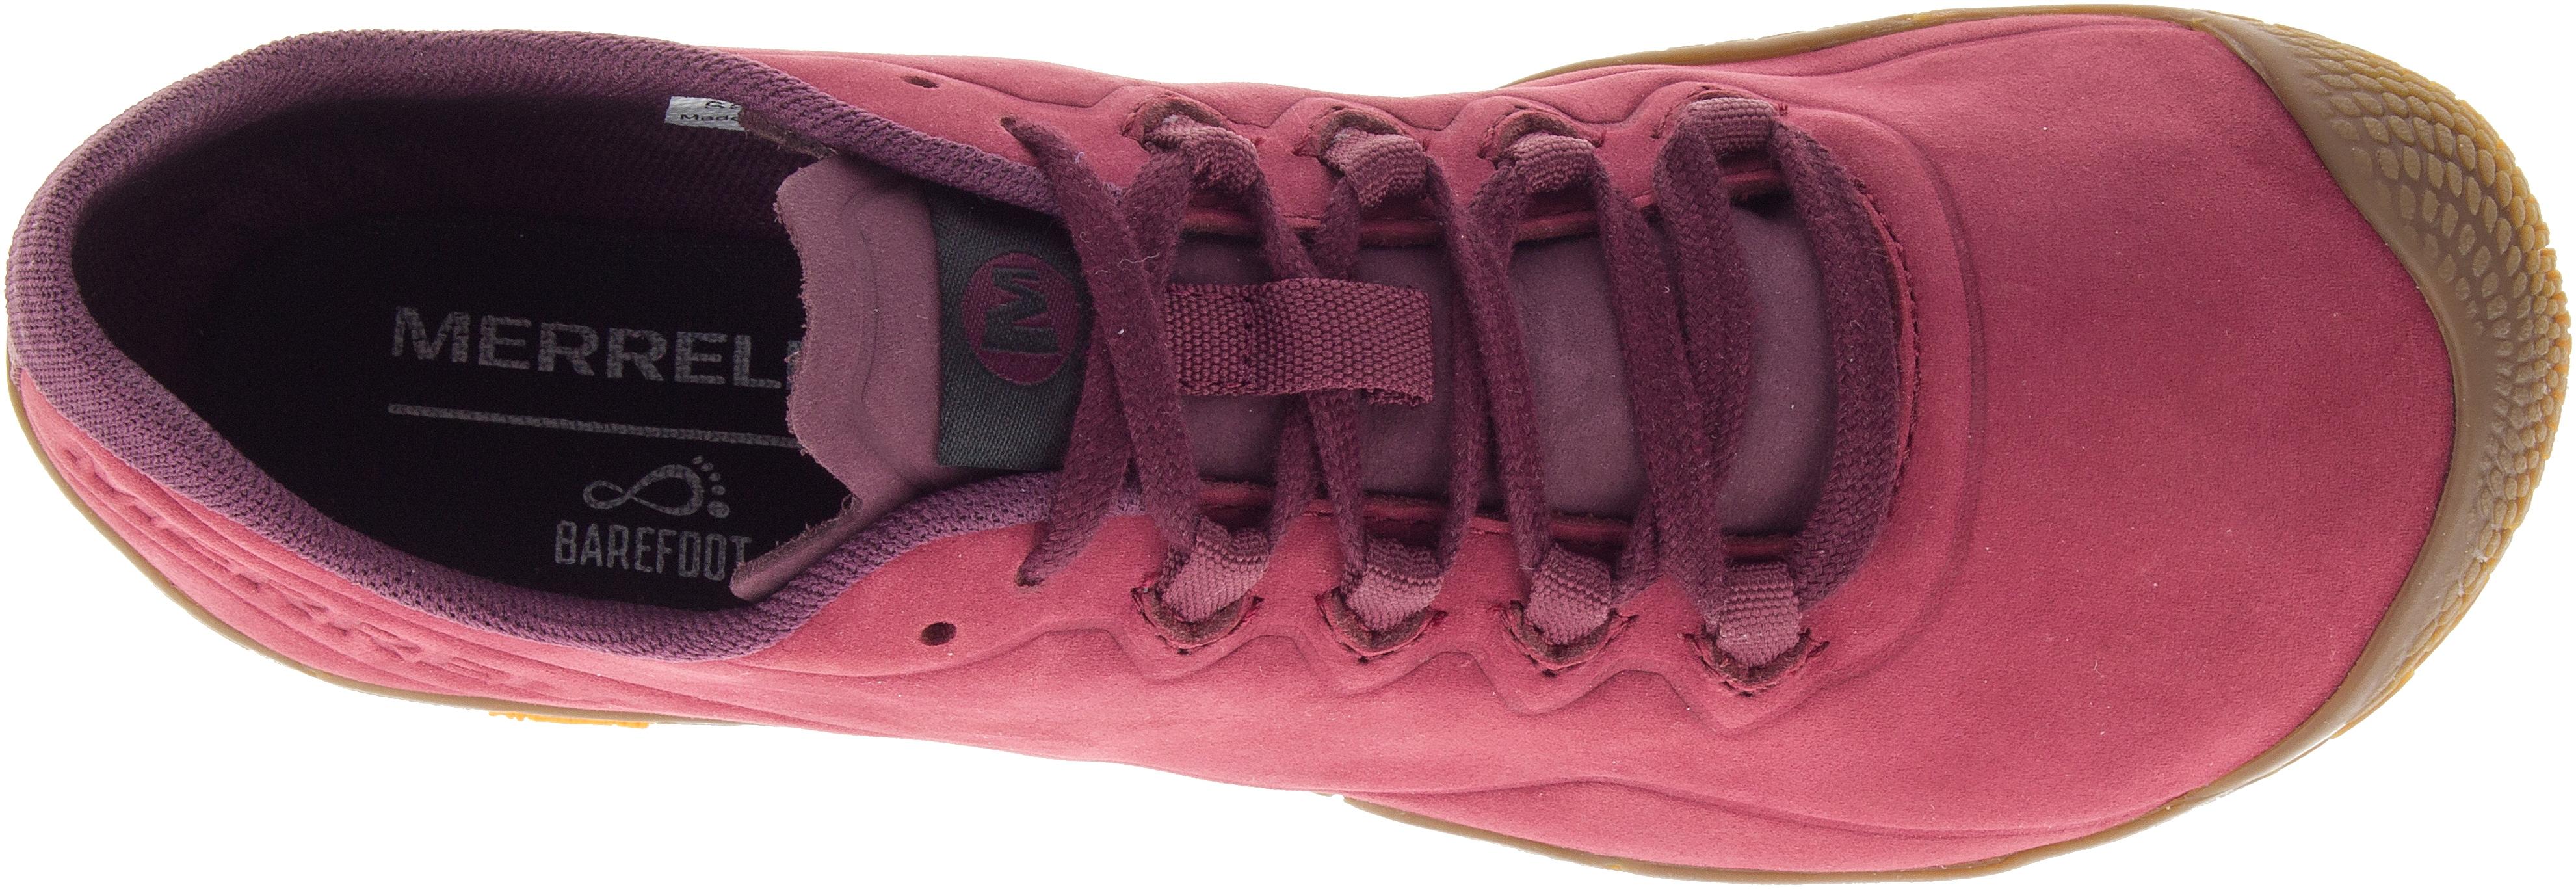 Vapor Glove Luna 3 Leather, Pomegranate